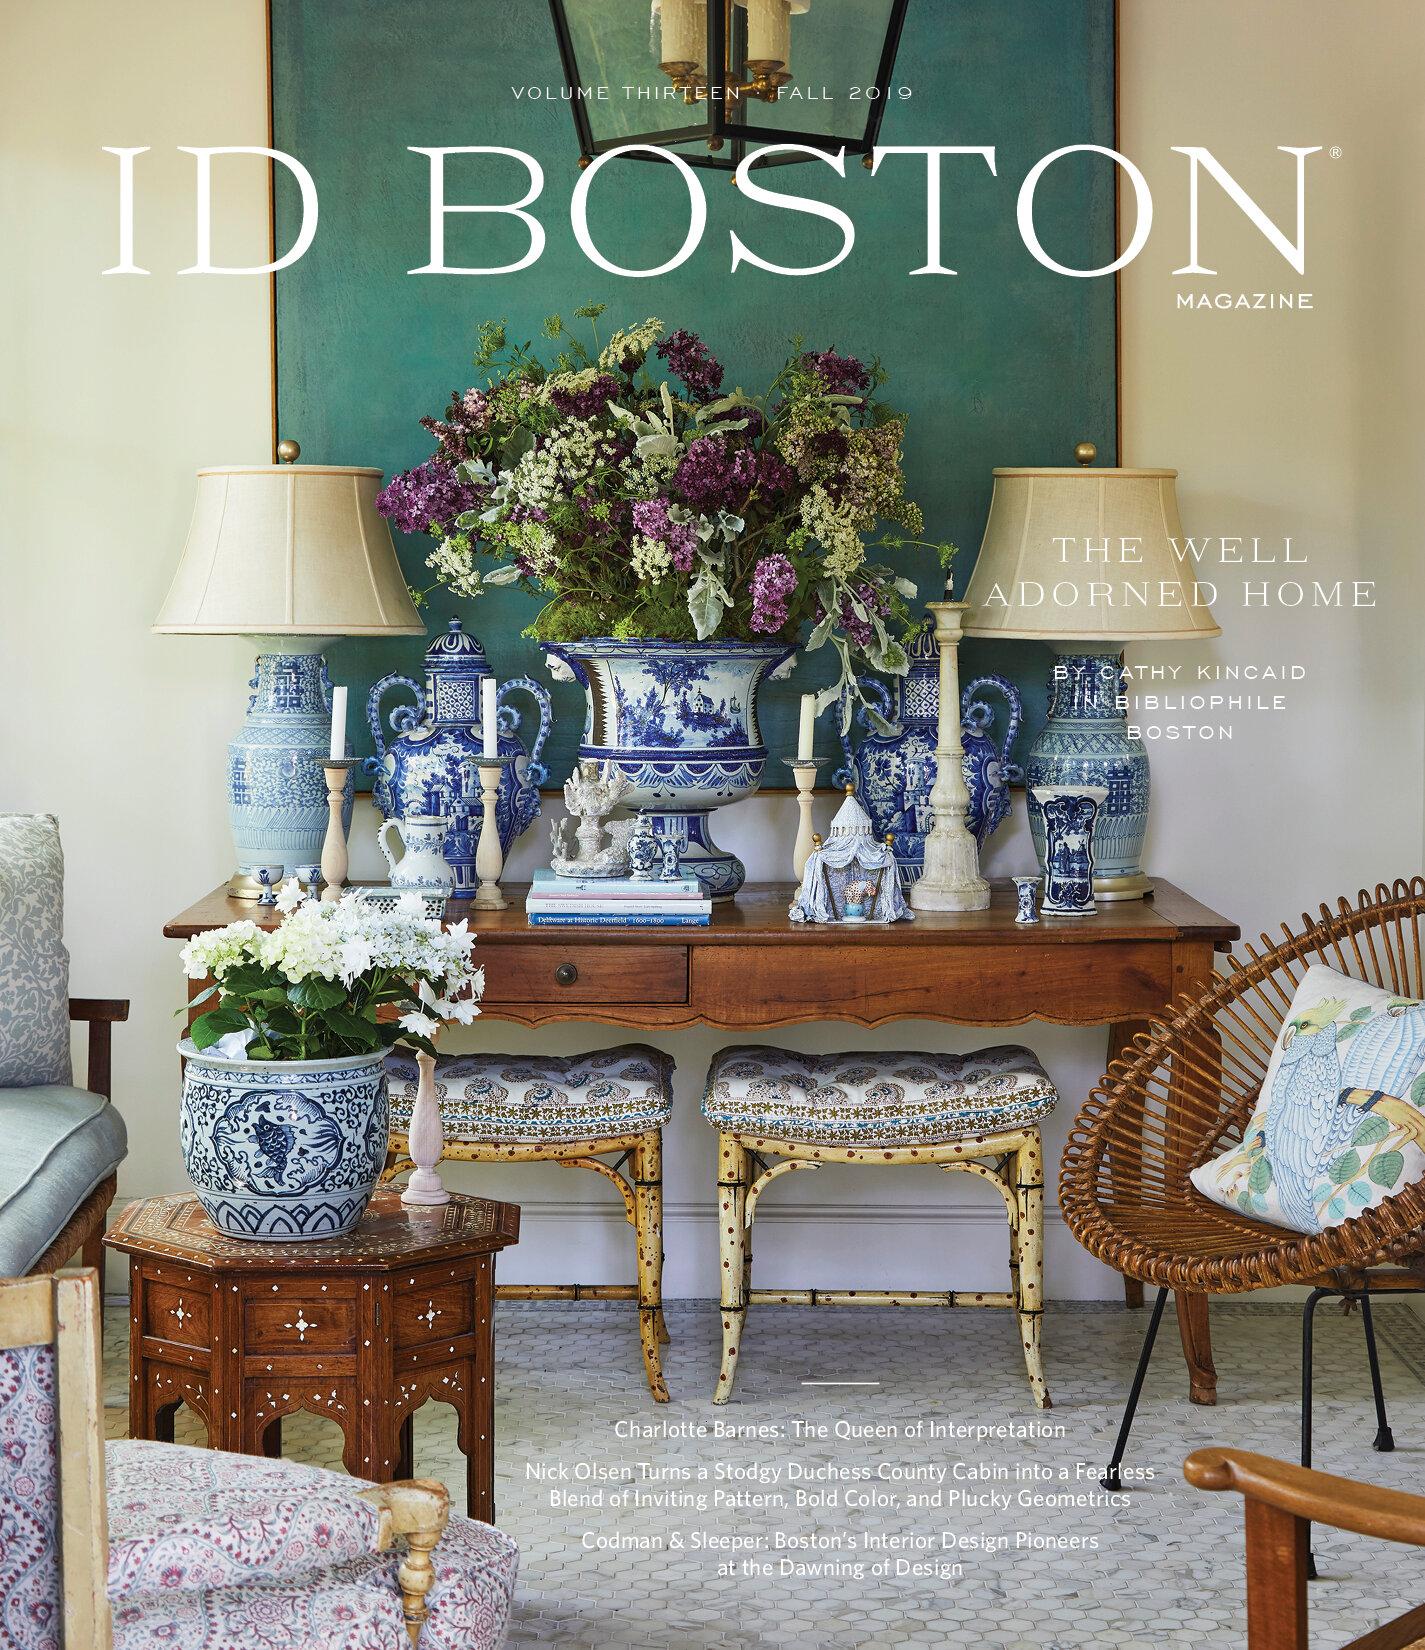 ID Boston Vol 13 Layout 20190827 CS A.jpg